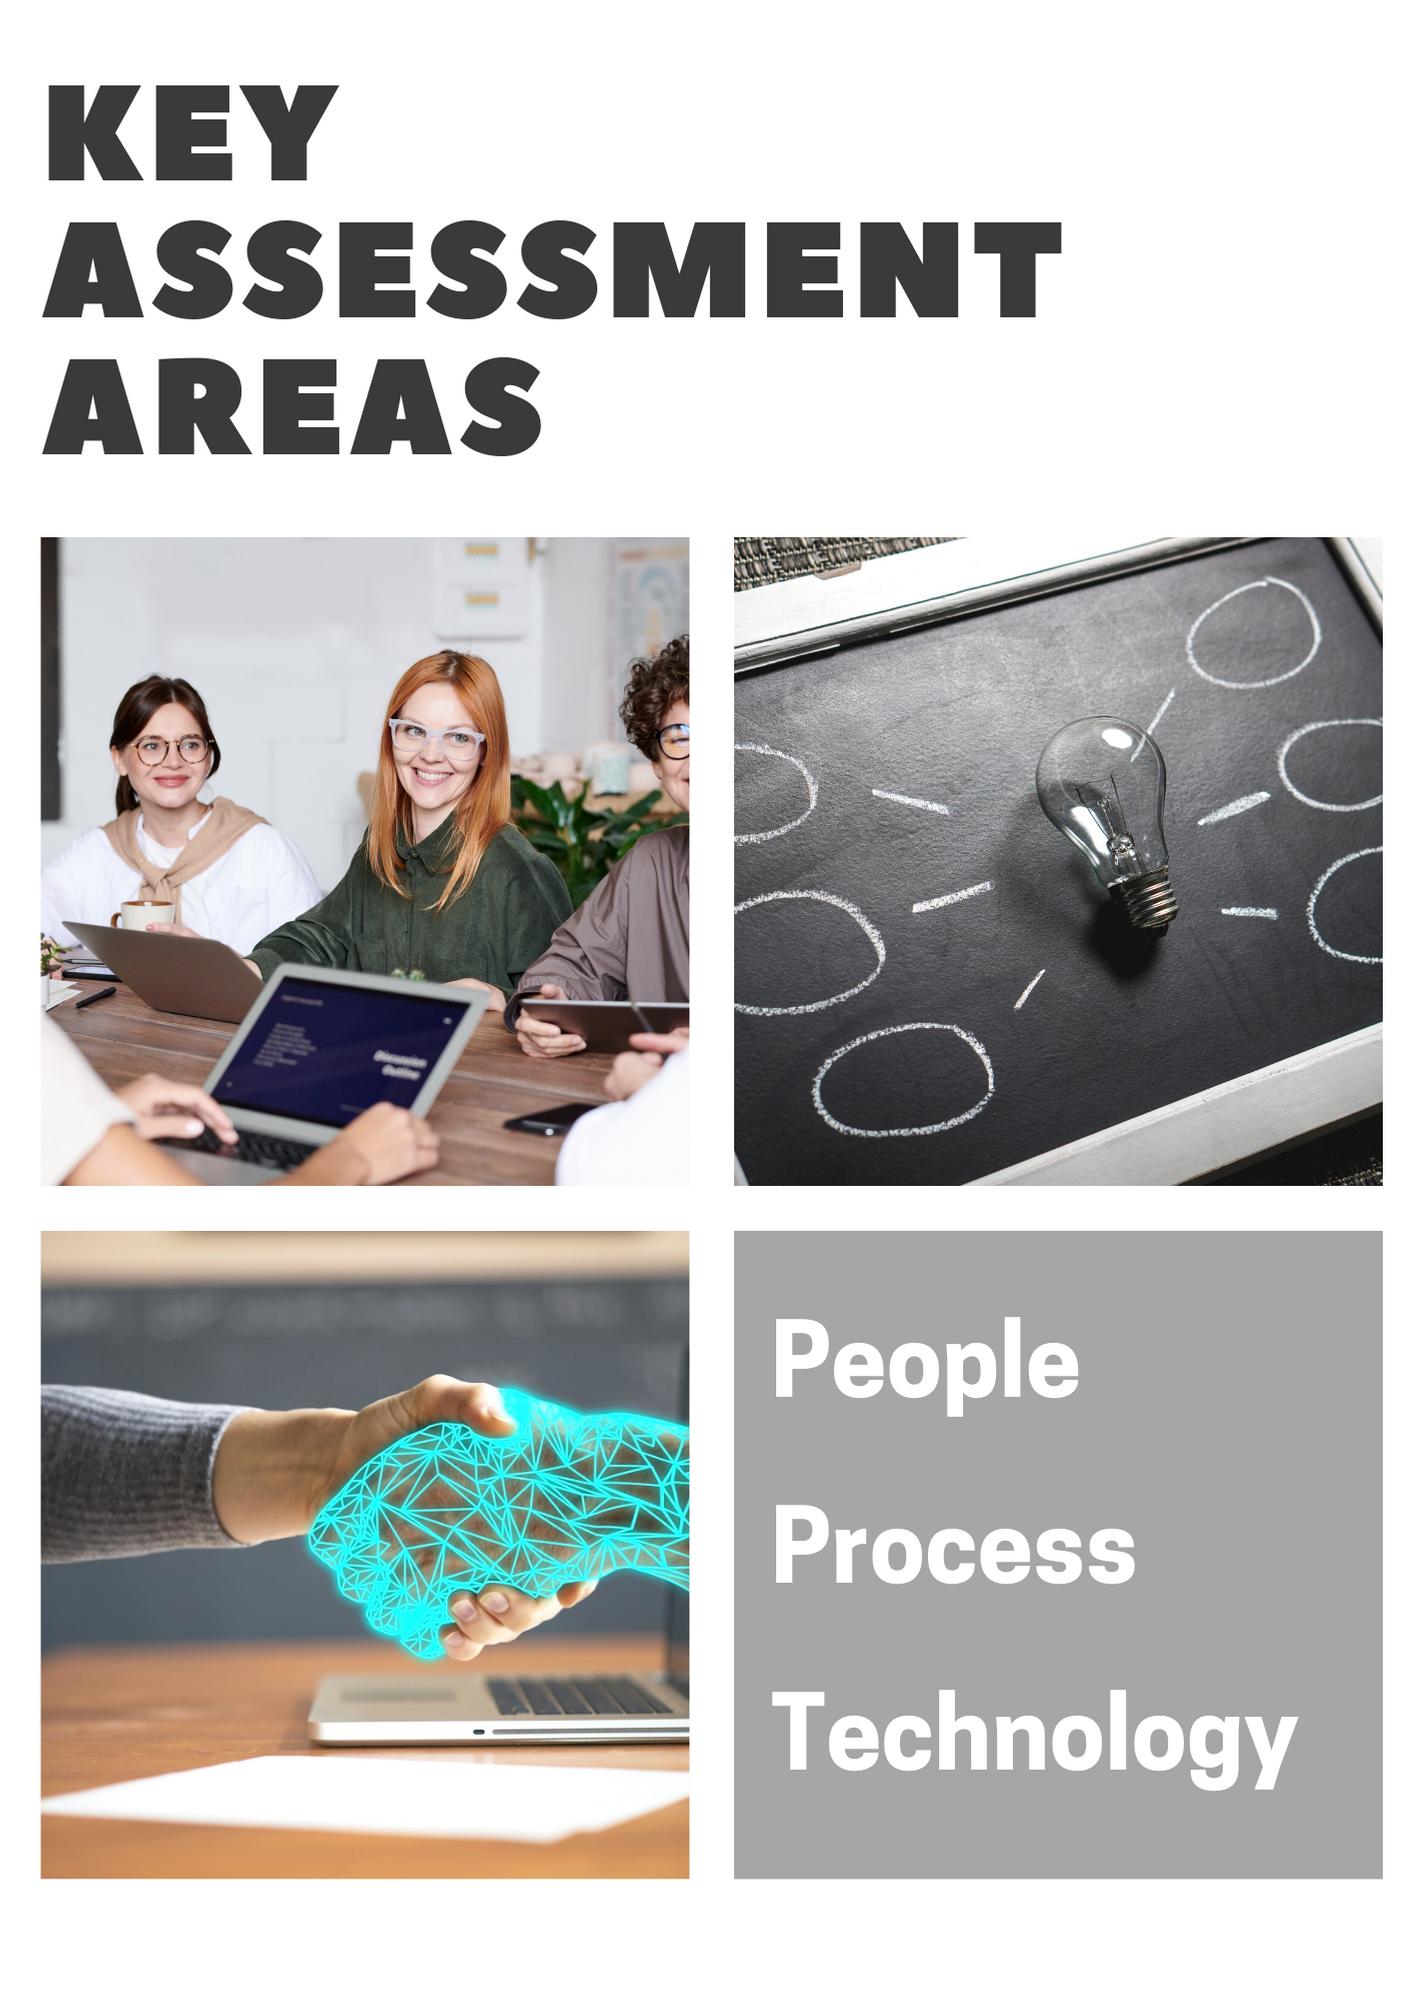 KLEAP Technologies IT audit and assessment